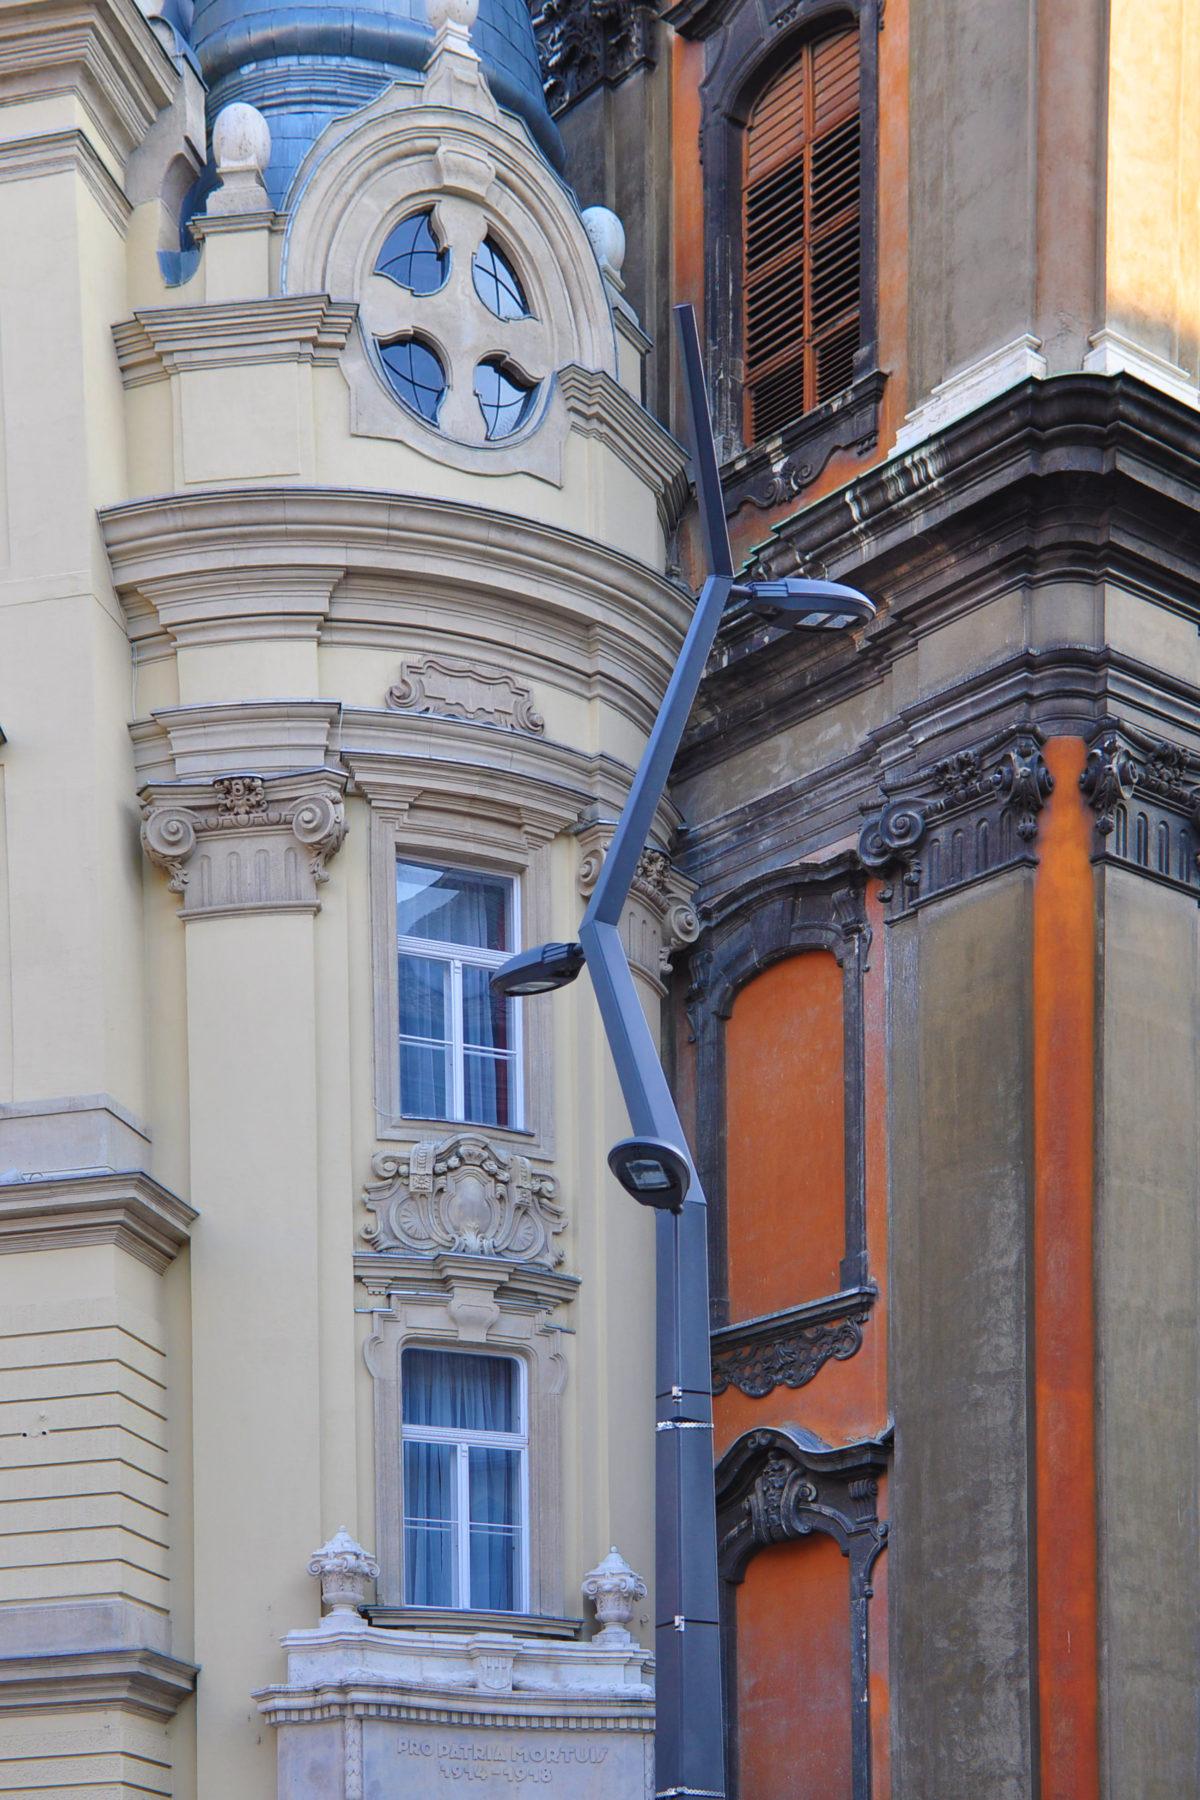 Facade - Classical architecture